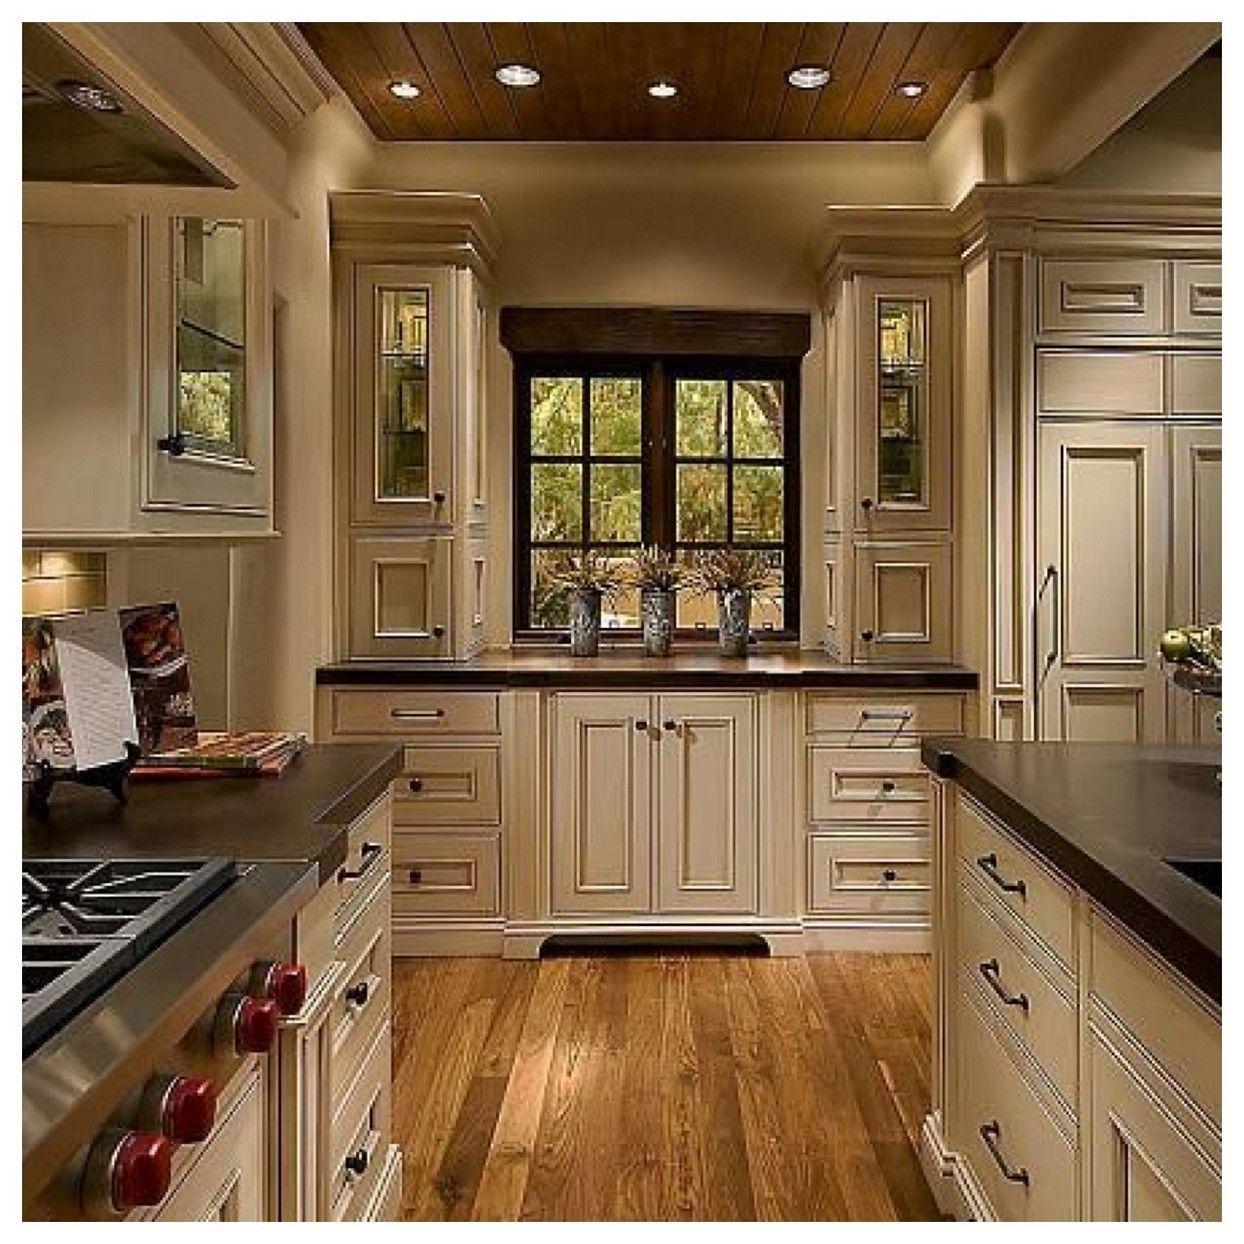 Light Wood Kitchen Cabinet Pictures Cherry Cabinets Kitchen Light Kitchen Cabinets Modern Kitchen Design